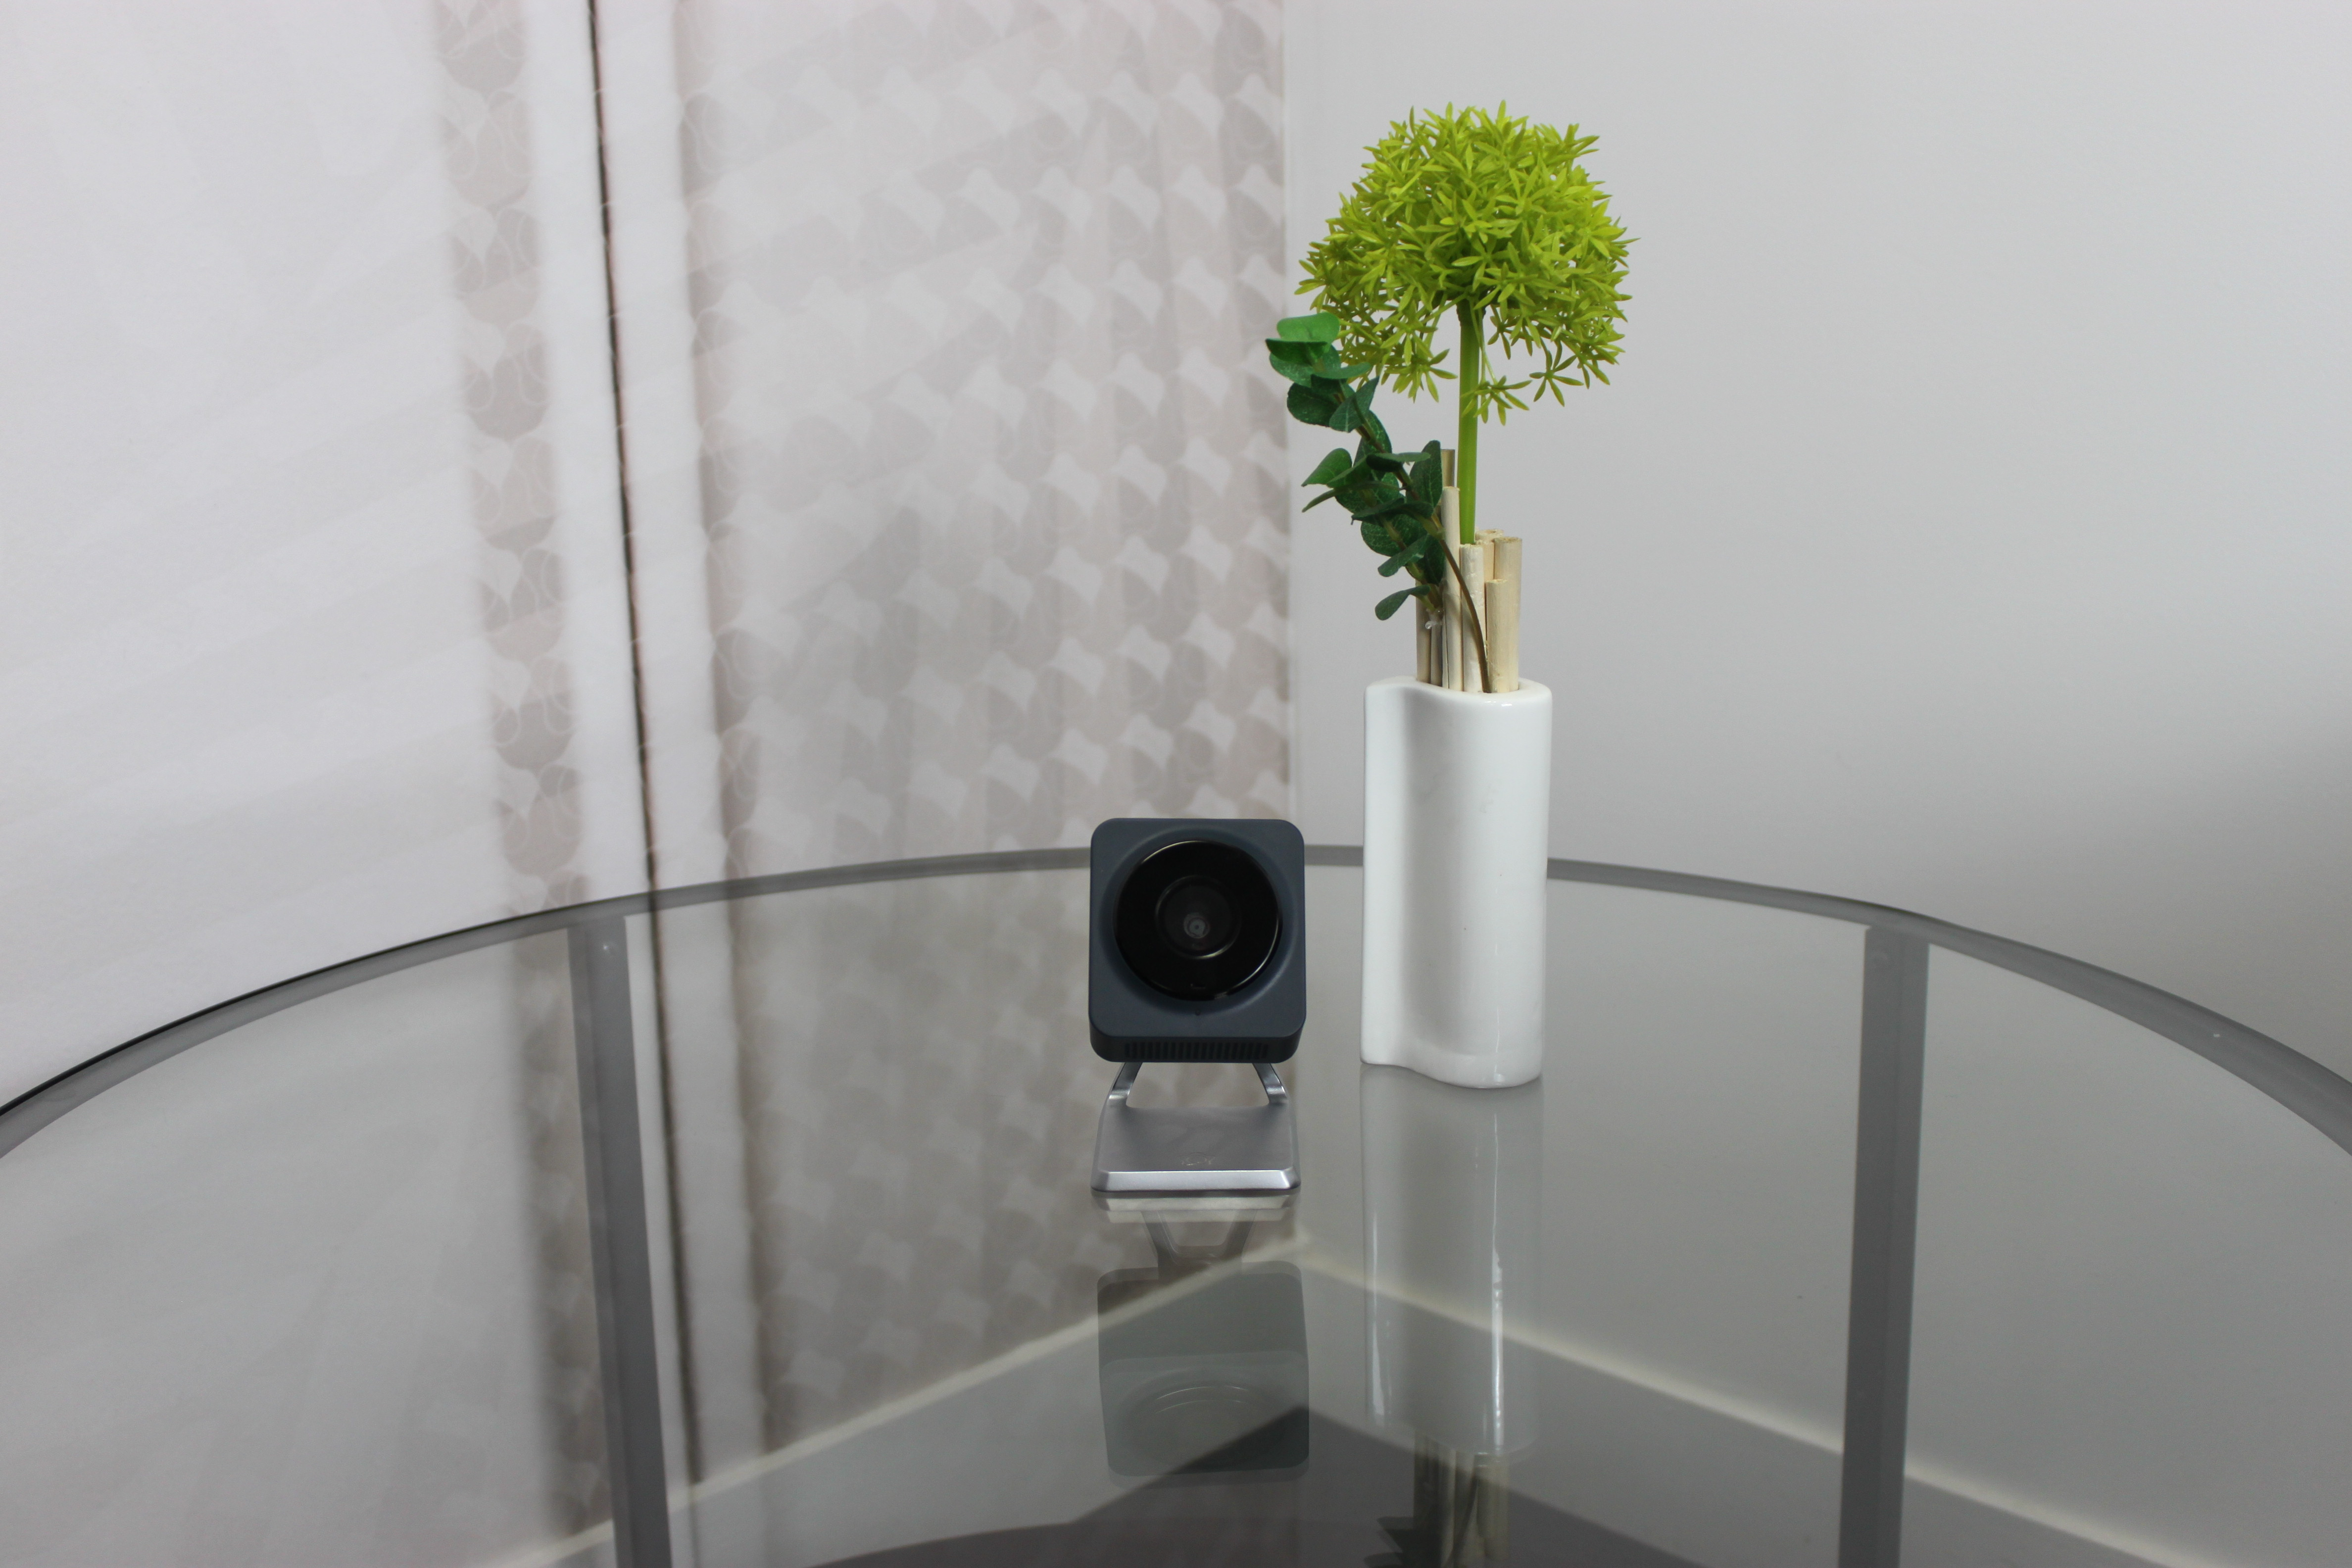 Caméra connectée verisure